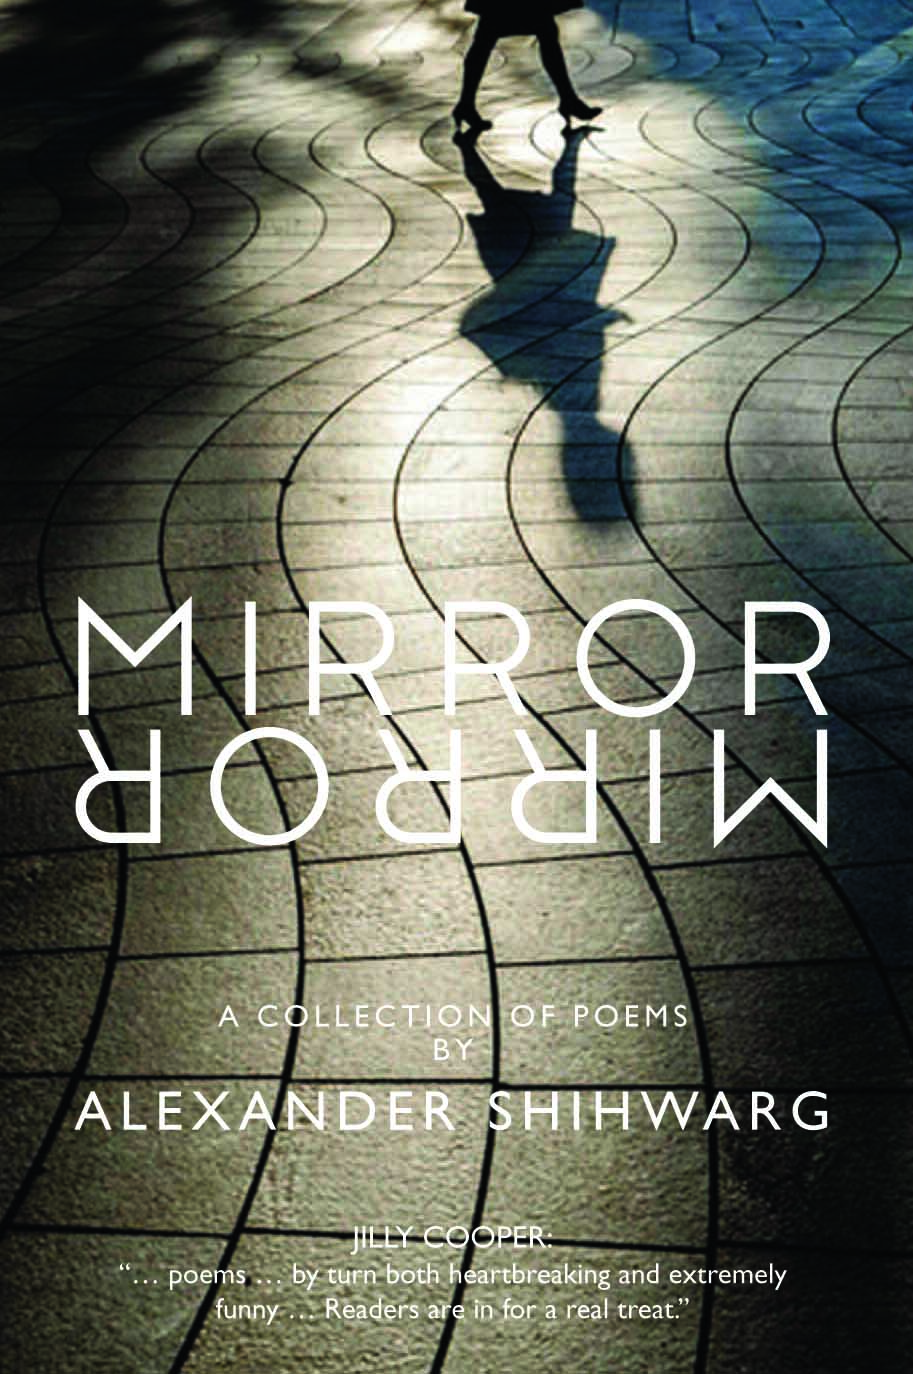 Mirror mirror cover.jpg